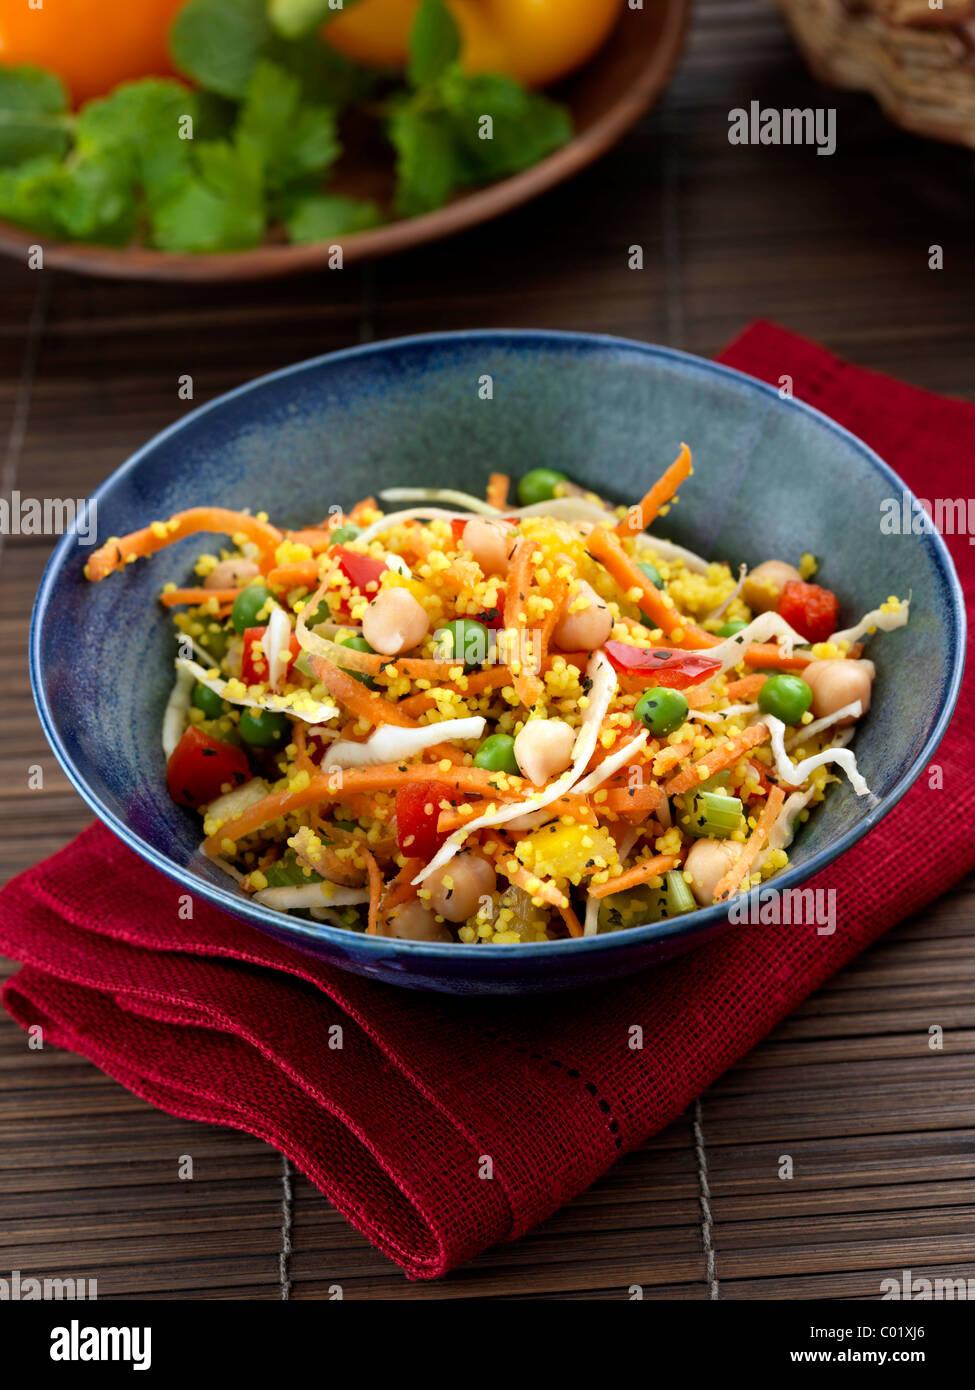 Chickpeas and peas salad - Stock Image